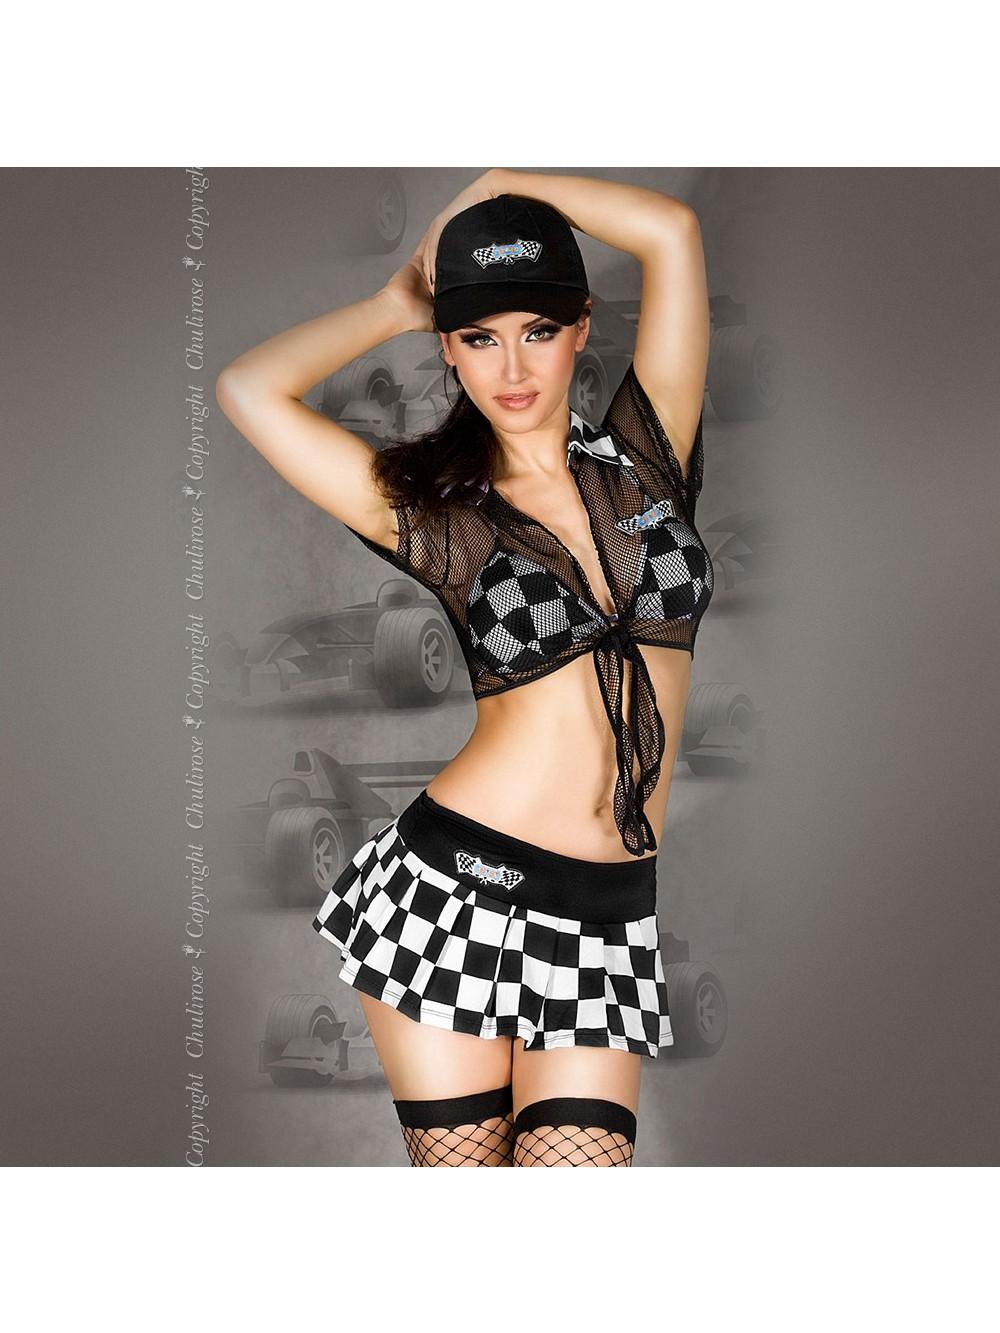 RACING GIRL COSTUME CR-3326 5902012009369